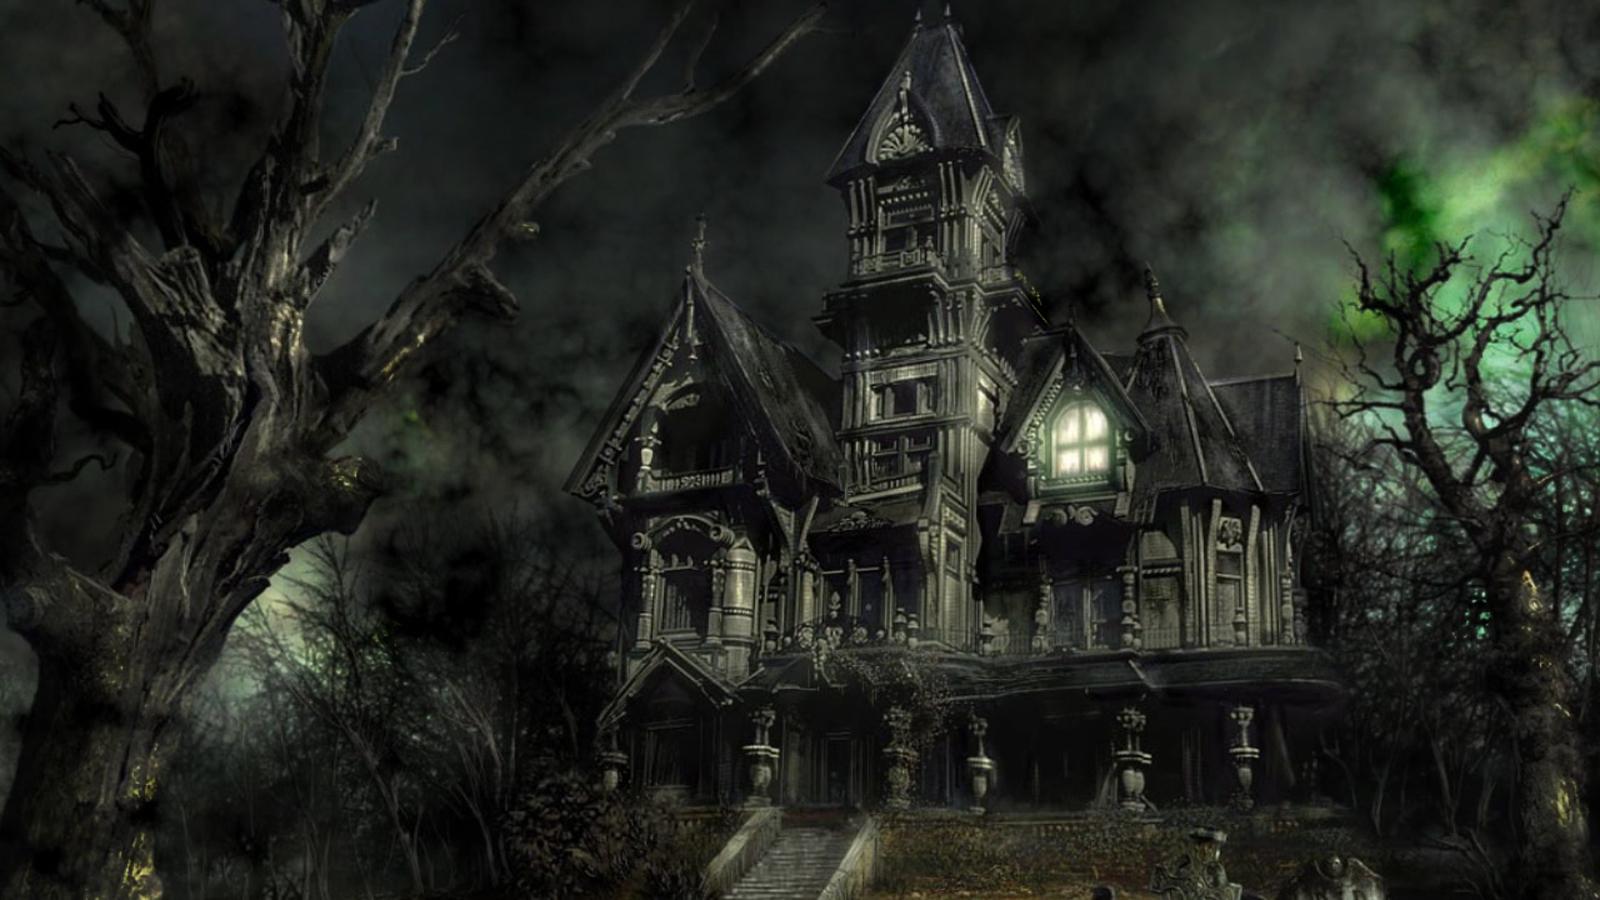 [49+] Haunted Mansion Wallpaper on WallpaperSafari